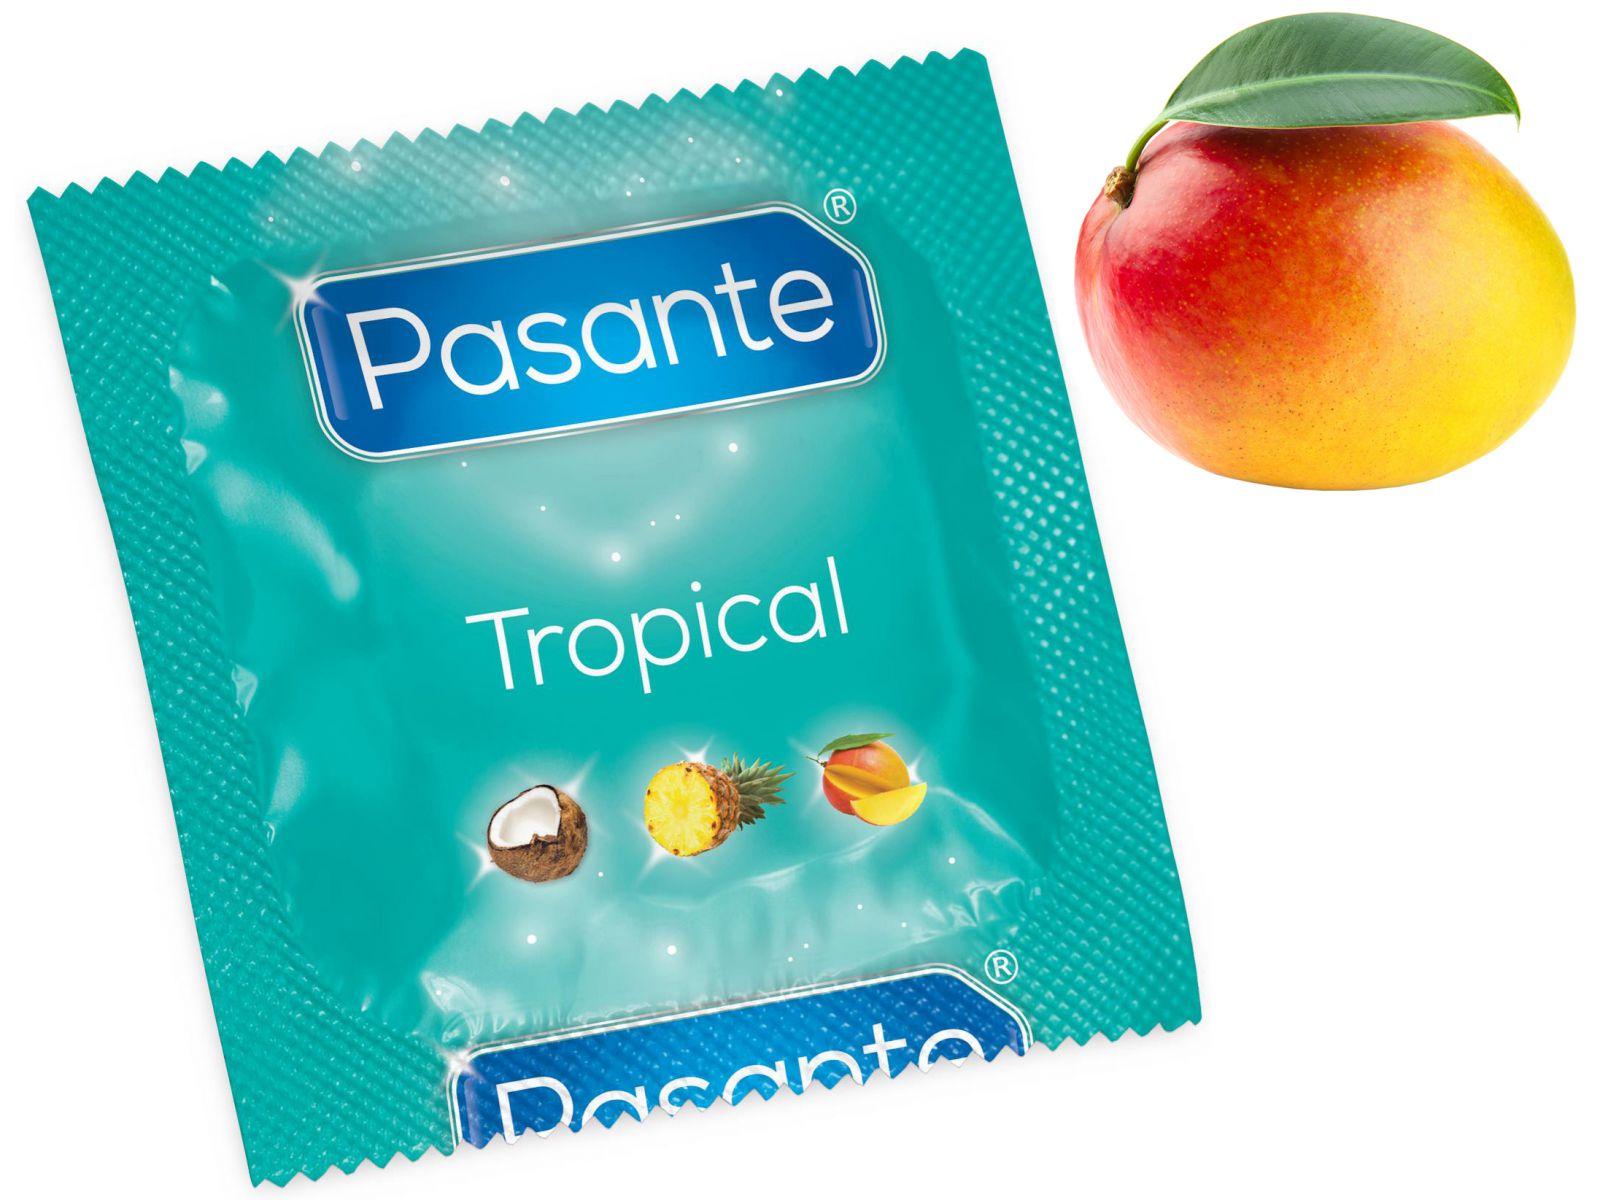 Kondom Pasante Tropical Mango